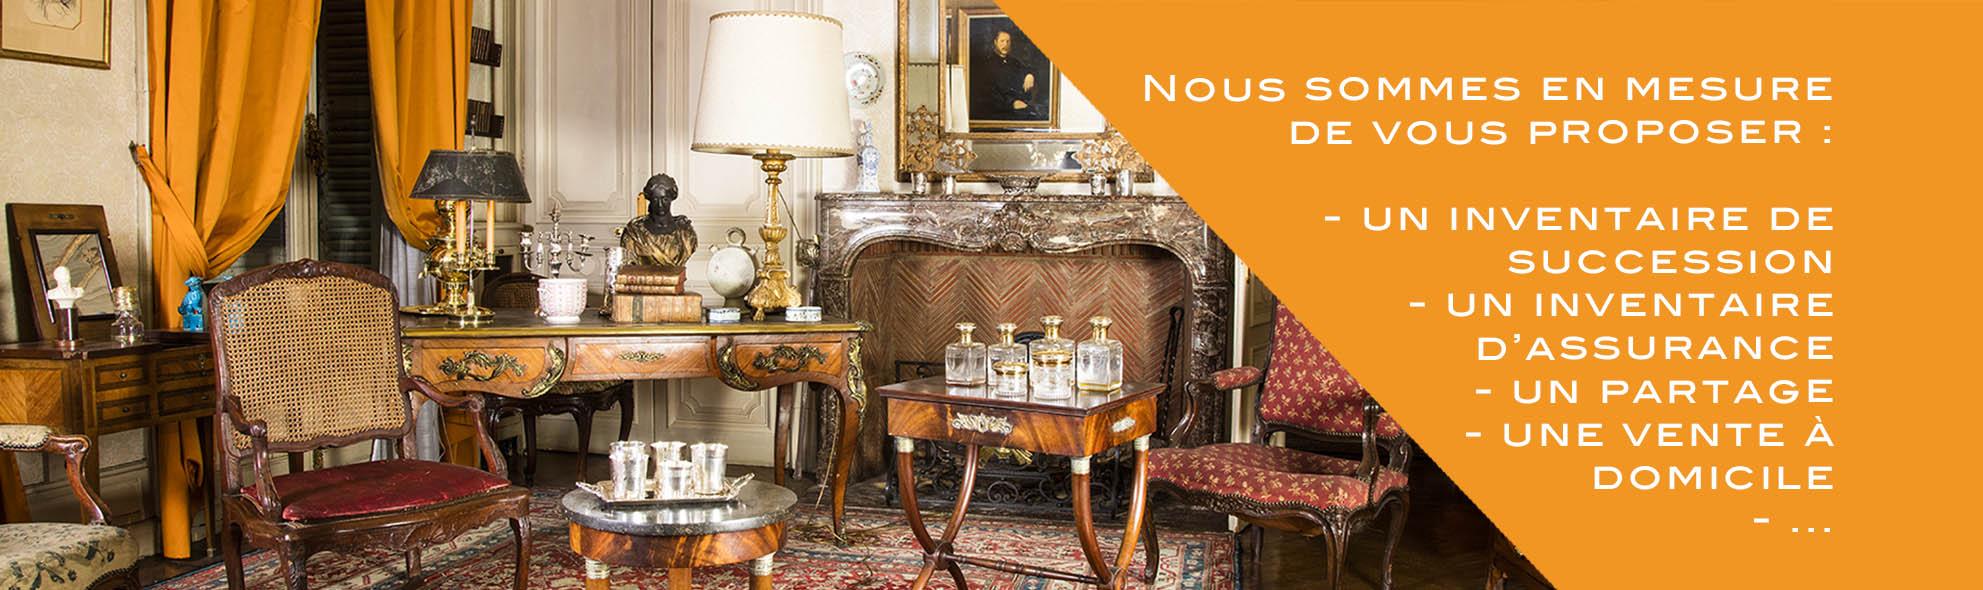 normandy auction. Black Bedroom Furniture Sets. Home Design Ideas